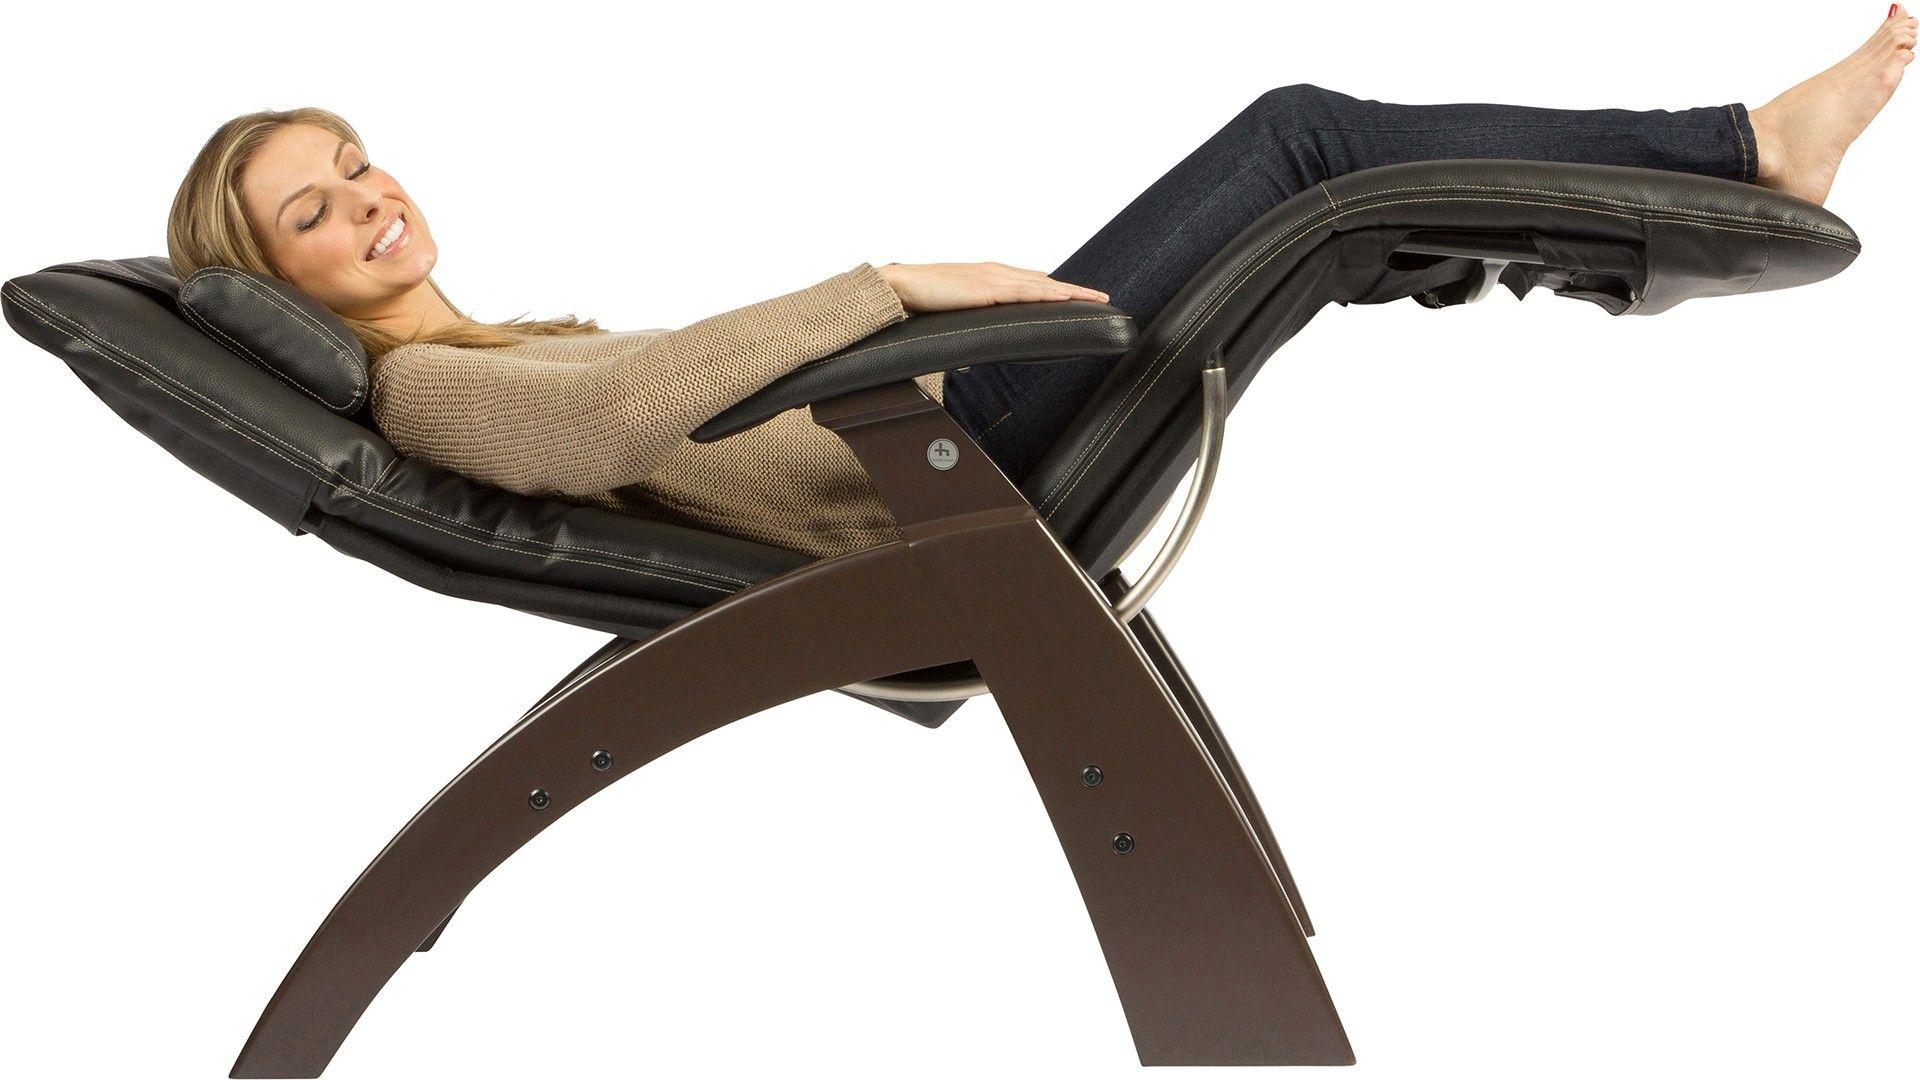 PC 300 Perfect Chair Zero Gravity Recliner